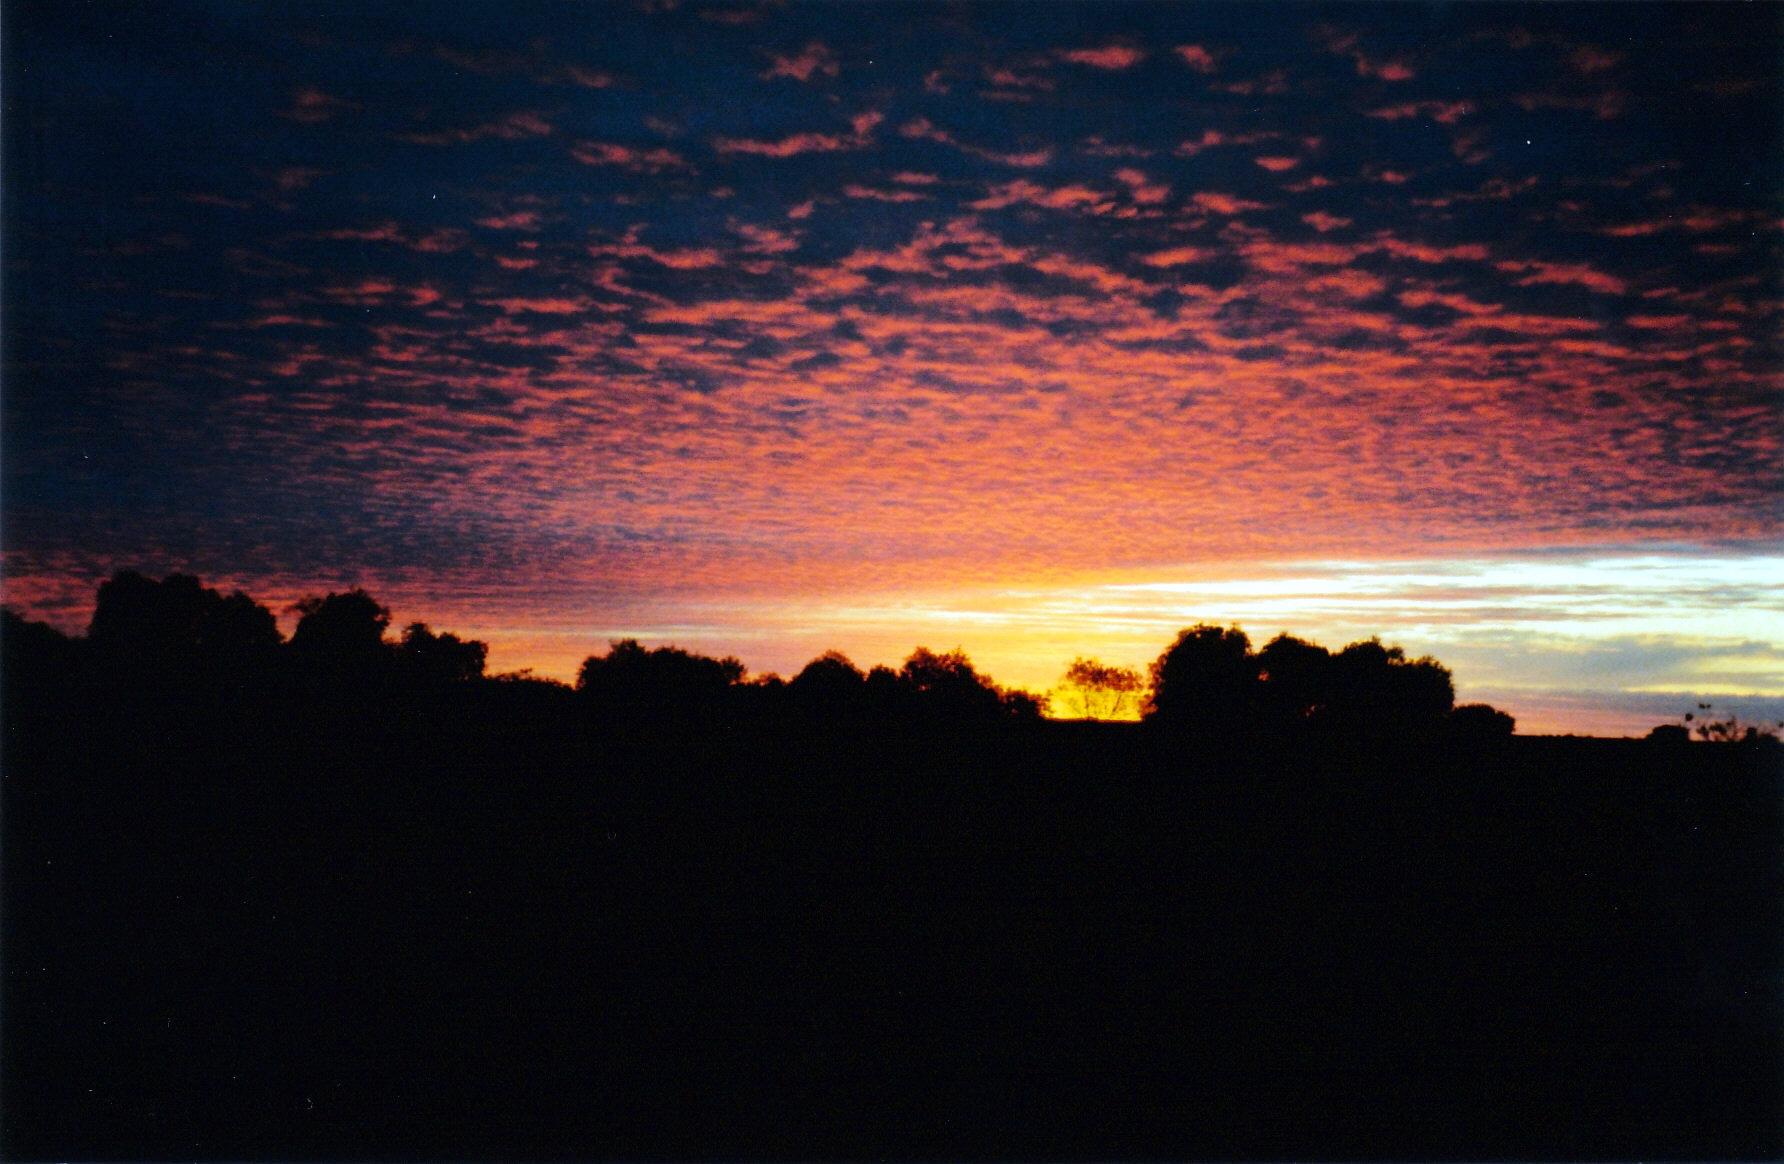 05-27-1999 07 sunset coward springs.jpg